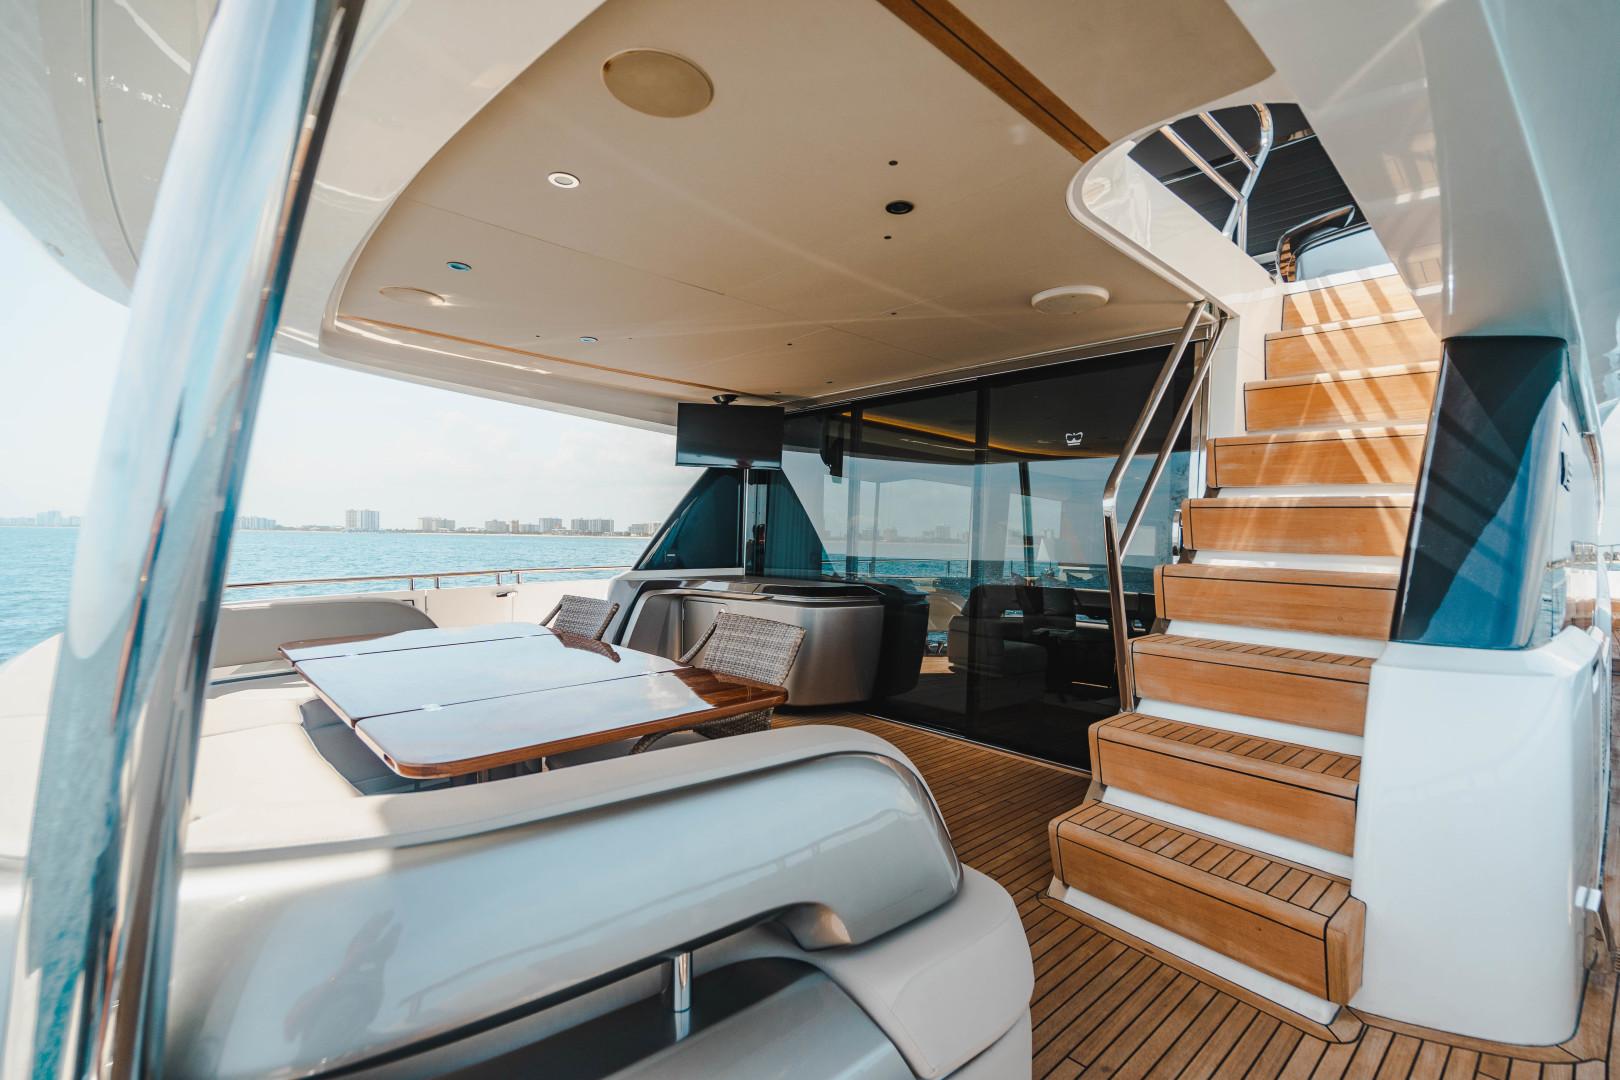 Princess-Y85  2019-Splash Delray Beach-Florida-United States-1631613 | Thumbnail